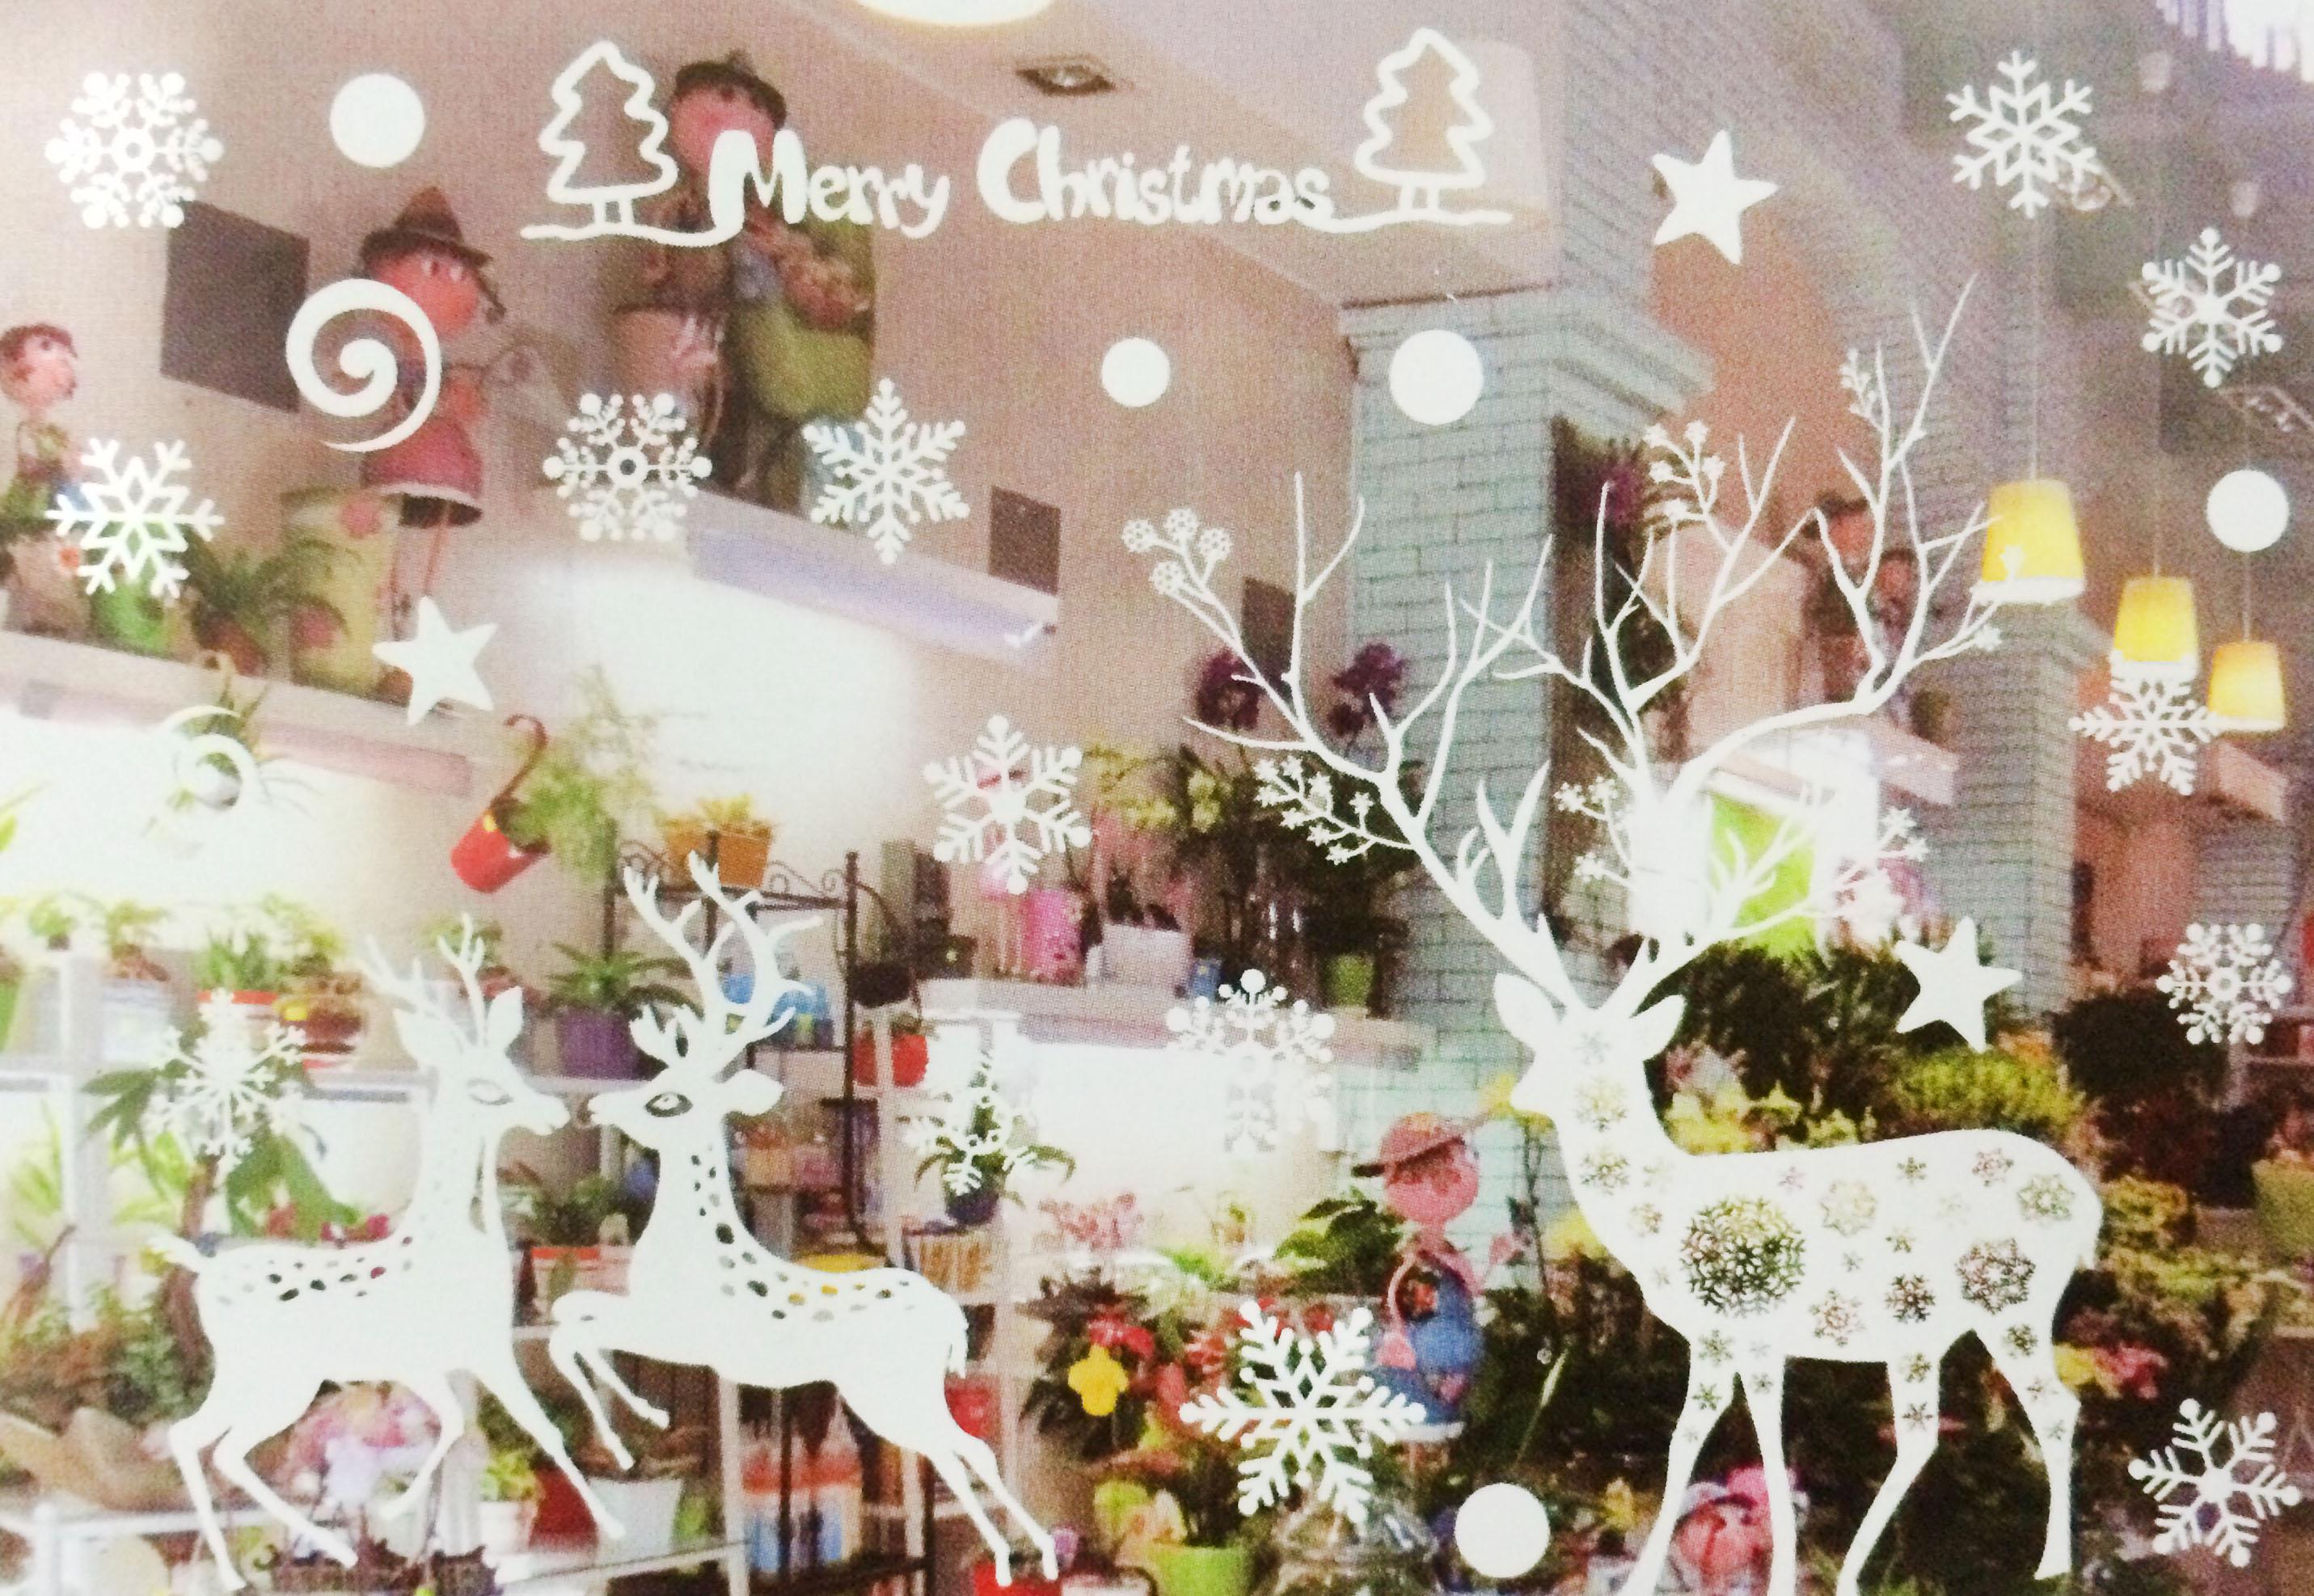 X射線【X150013】麋鹿雪花(白色)靜電窗貼,聖誕節/聖誕擺飾/聖誕佈置/聖誕造景/聖誕裝飾/玻璃貼/牆面佈置/壁貼